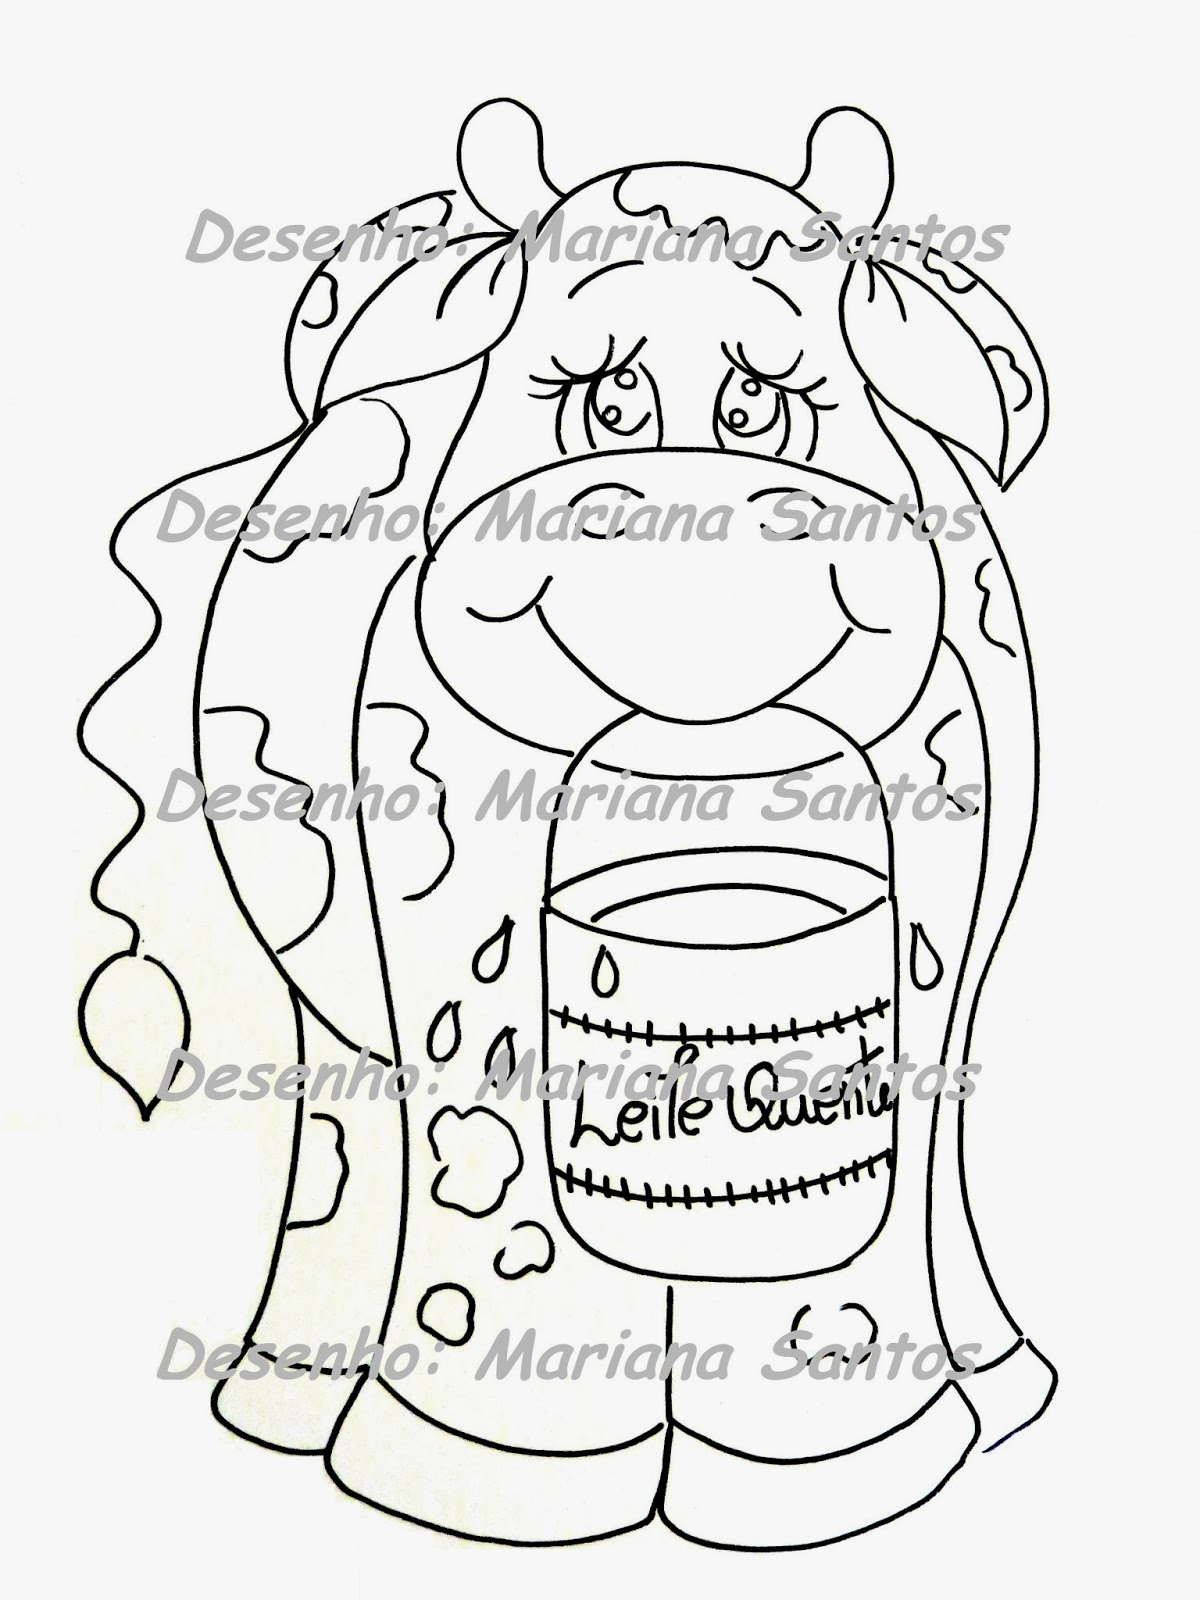 1200x1600 Arts Mariana Santos Various Drawings Country! Exclusive Dp